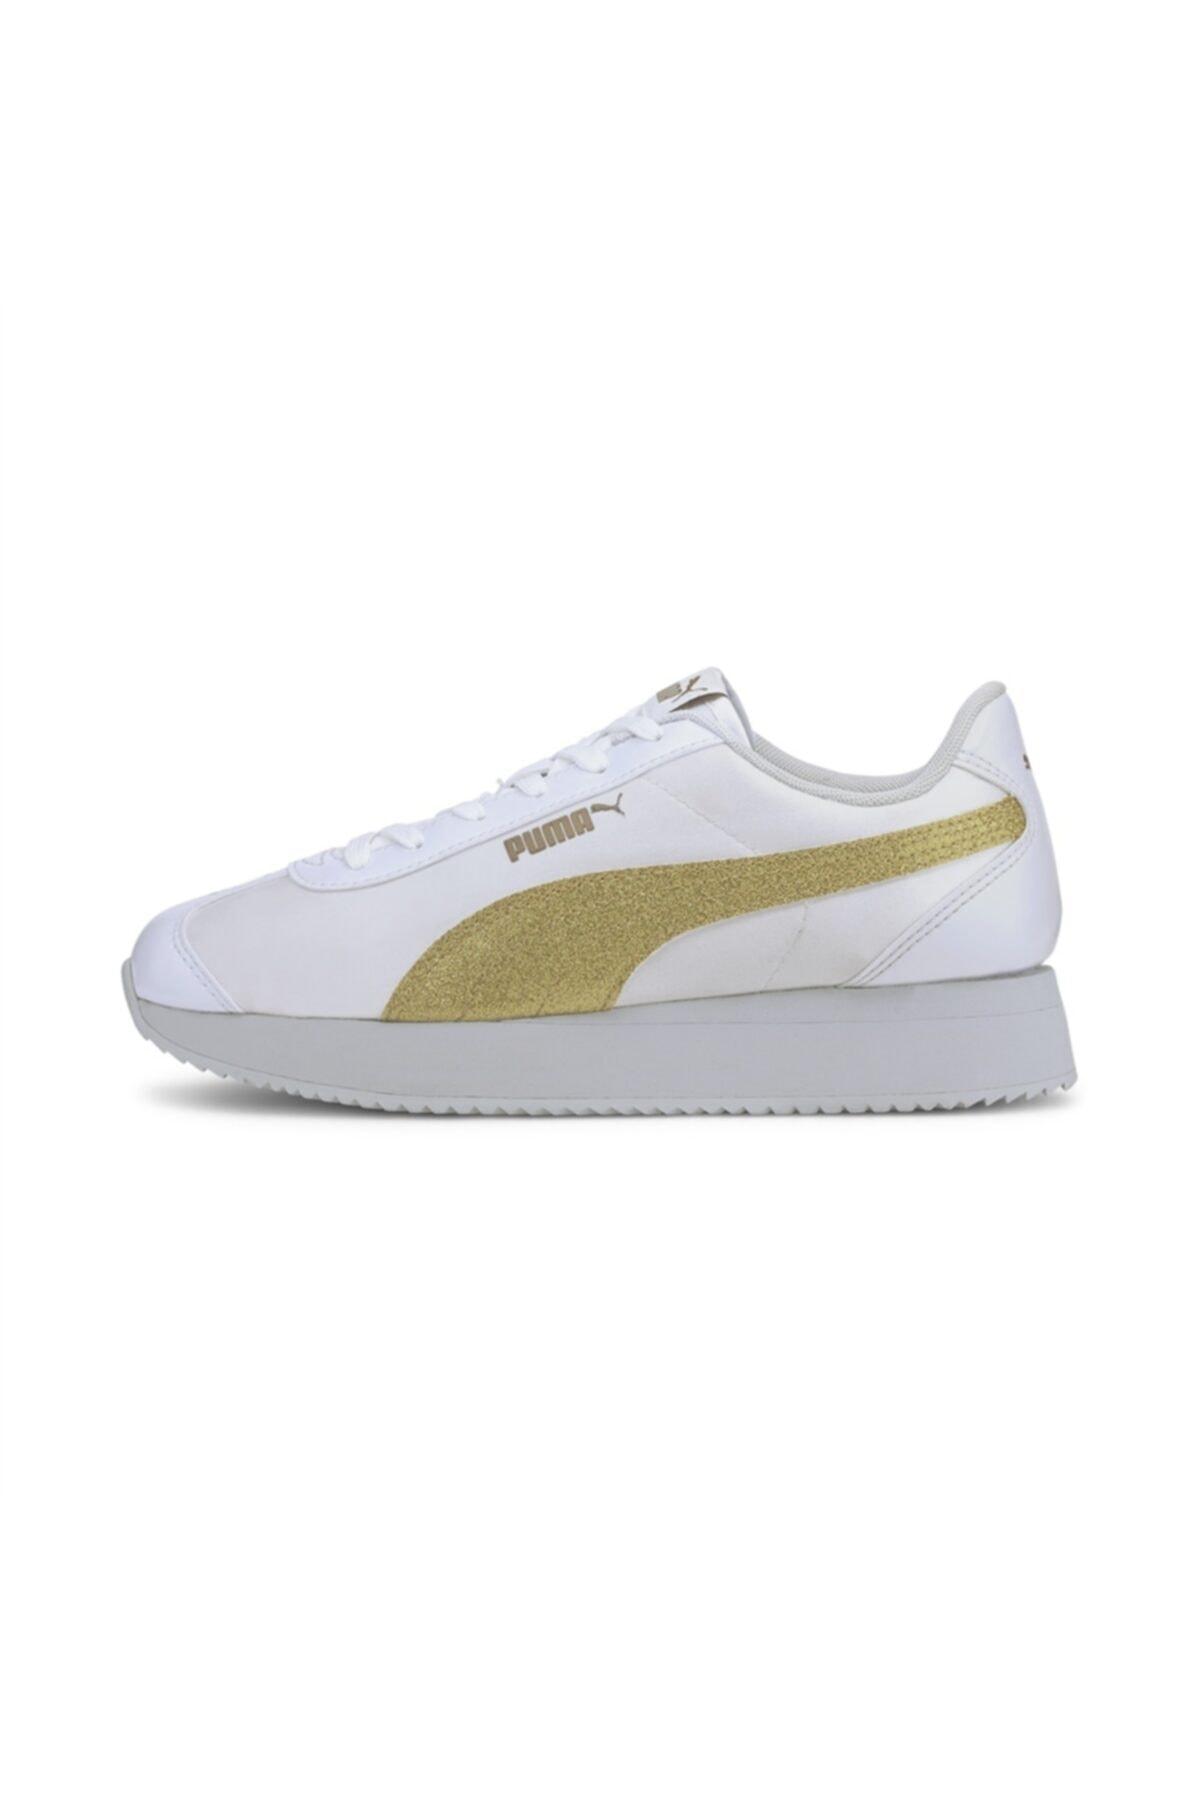 Puma Turino Stacked Glitter P Kadın Günlük Ayakkabı - 37194406 1